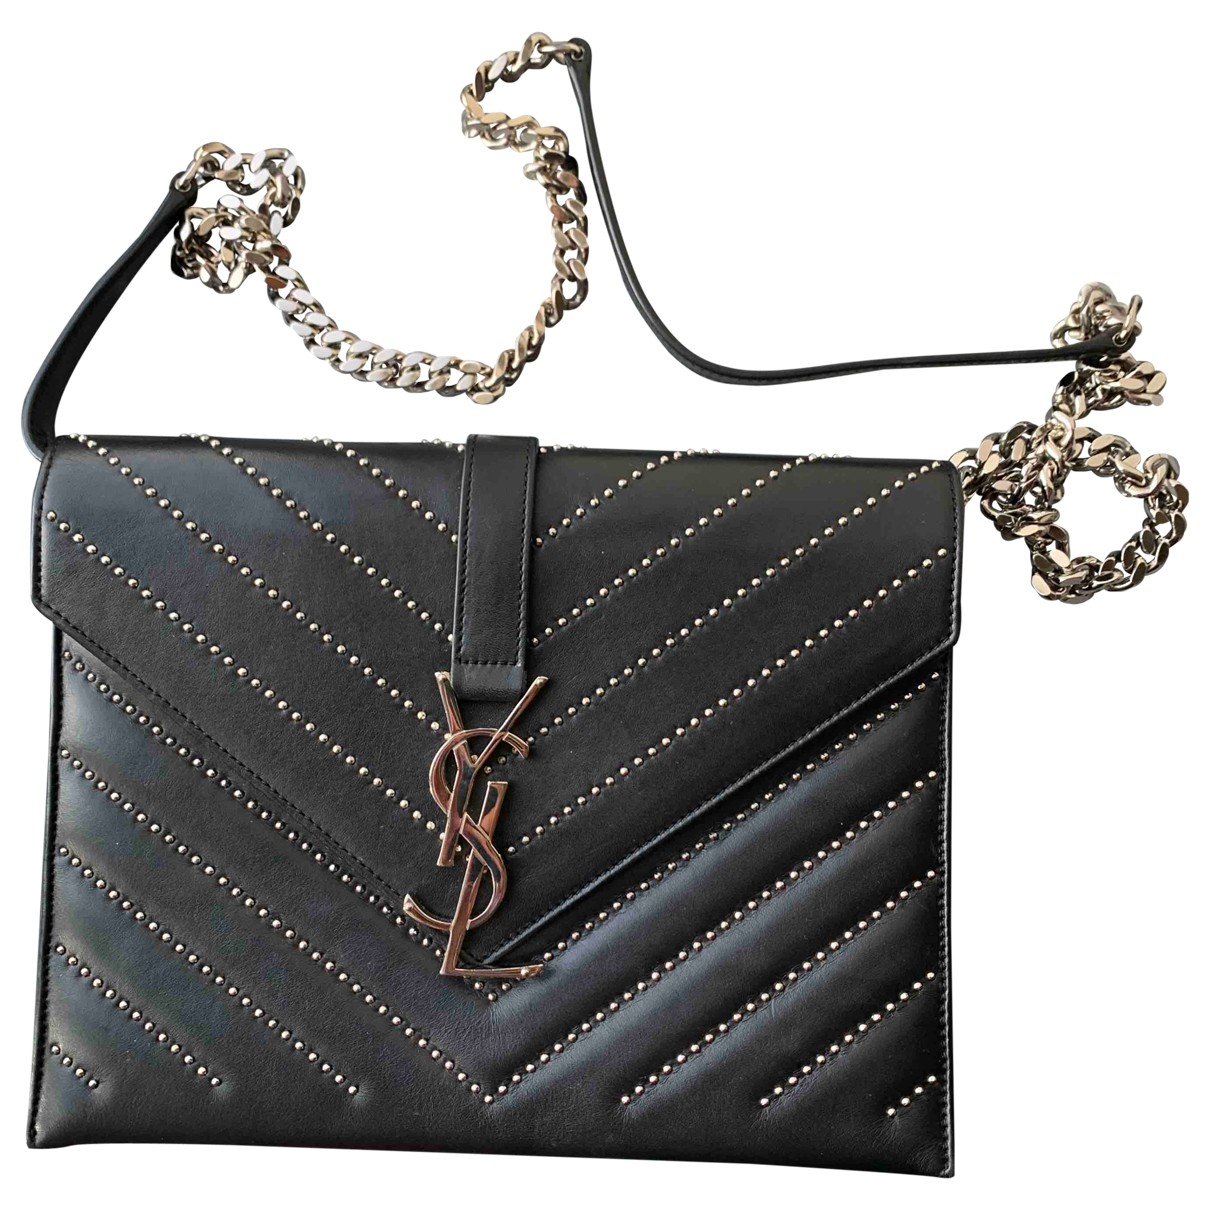 Saint Laurent Satchel monogramme Black Leather handbag for Women \N